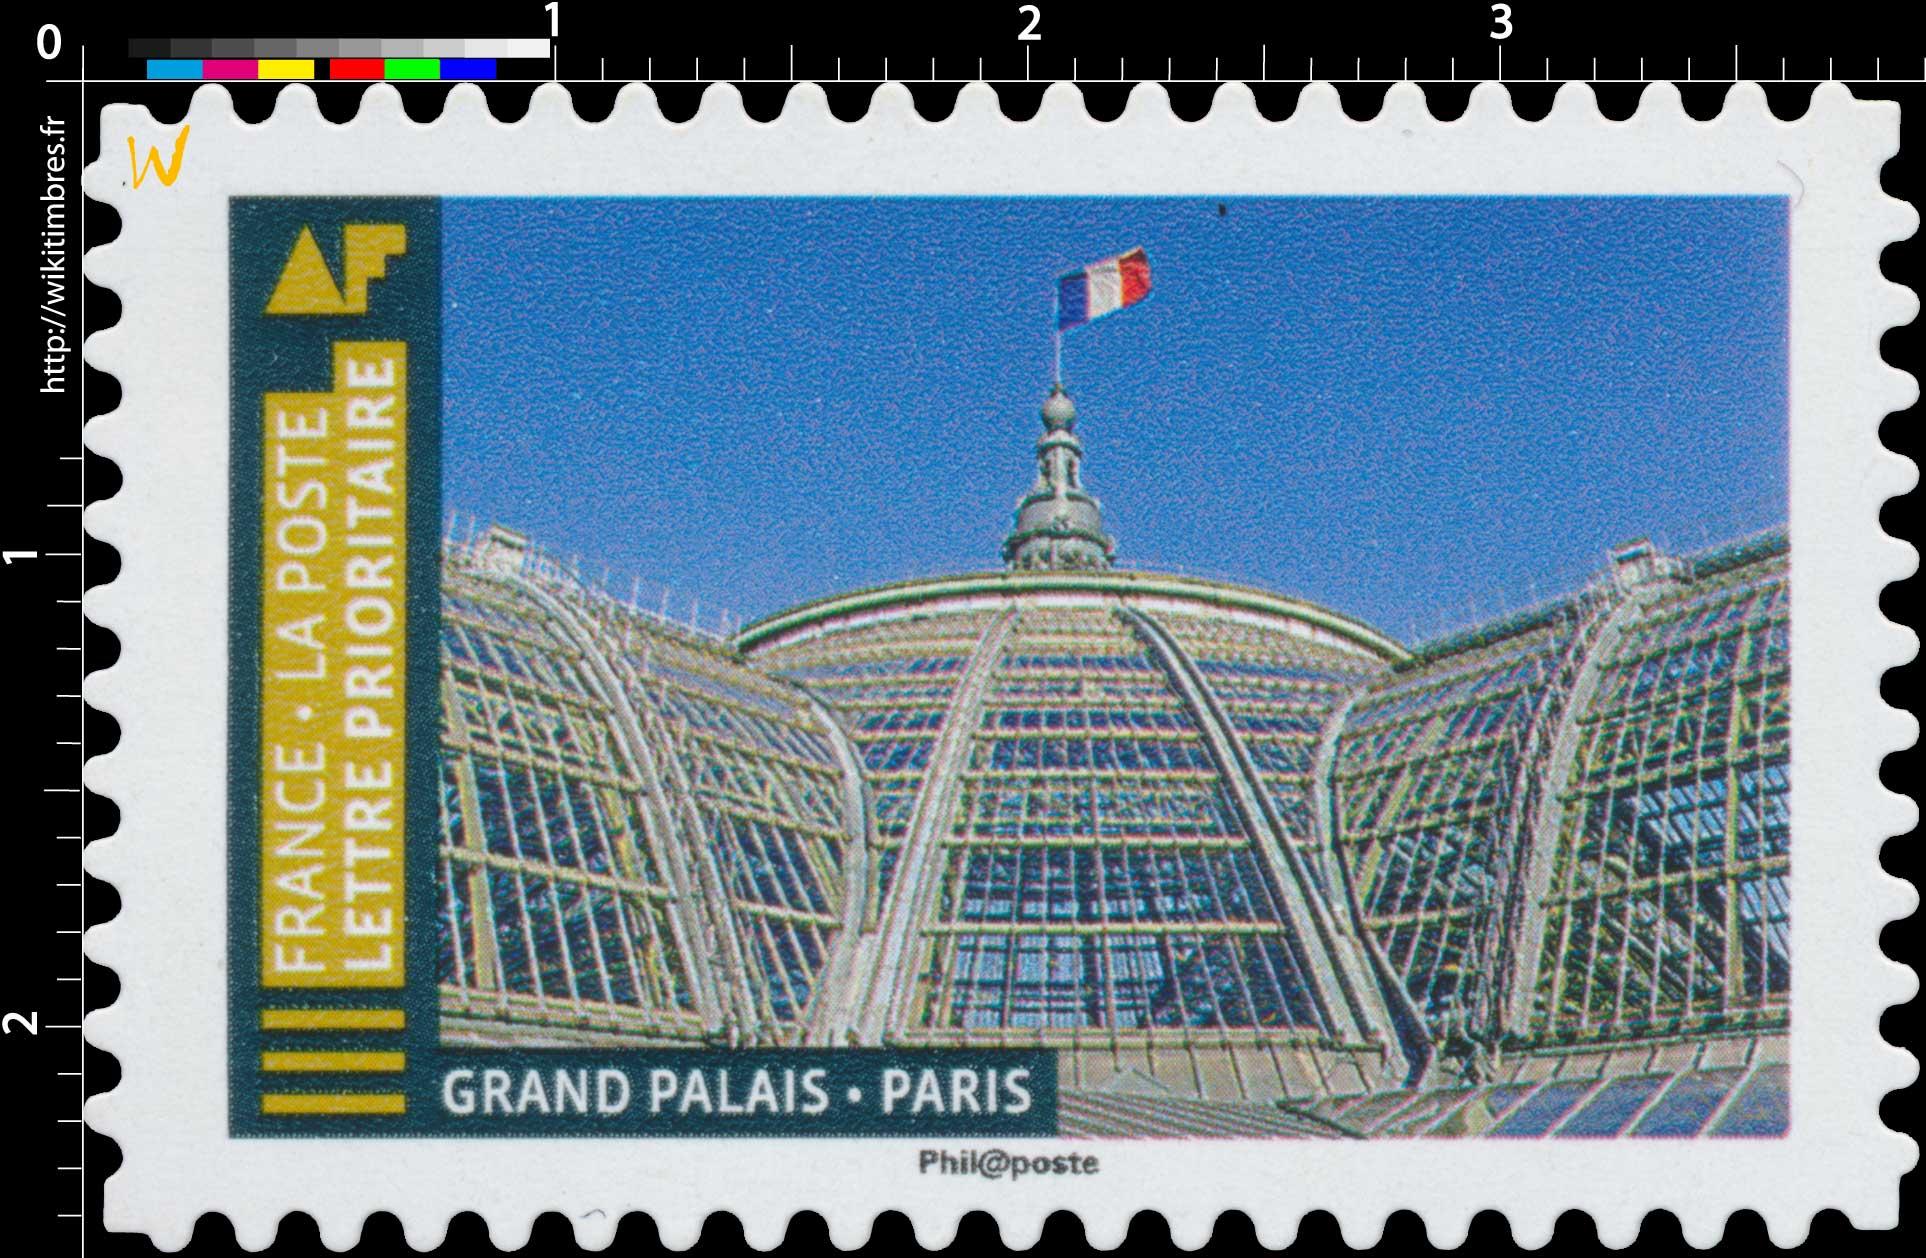 2019 Grand Palais - Paris